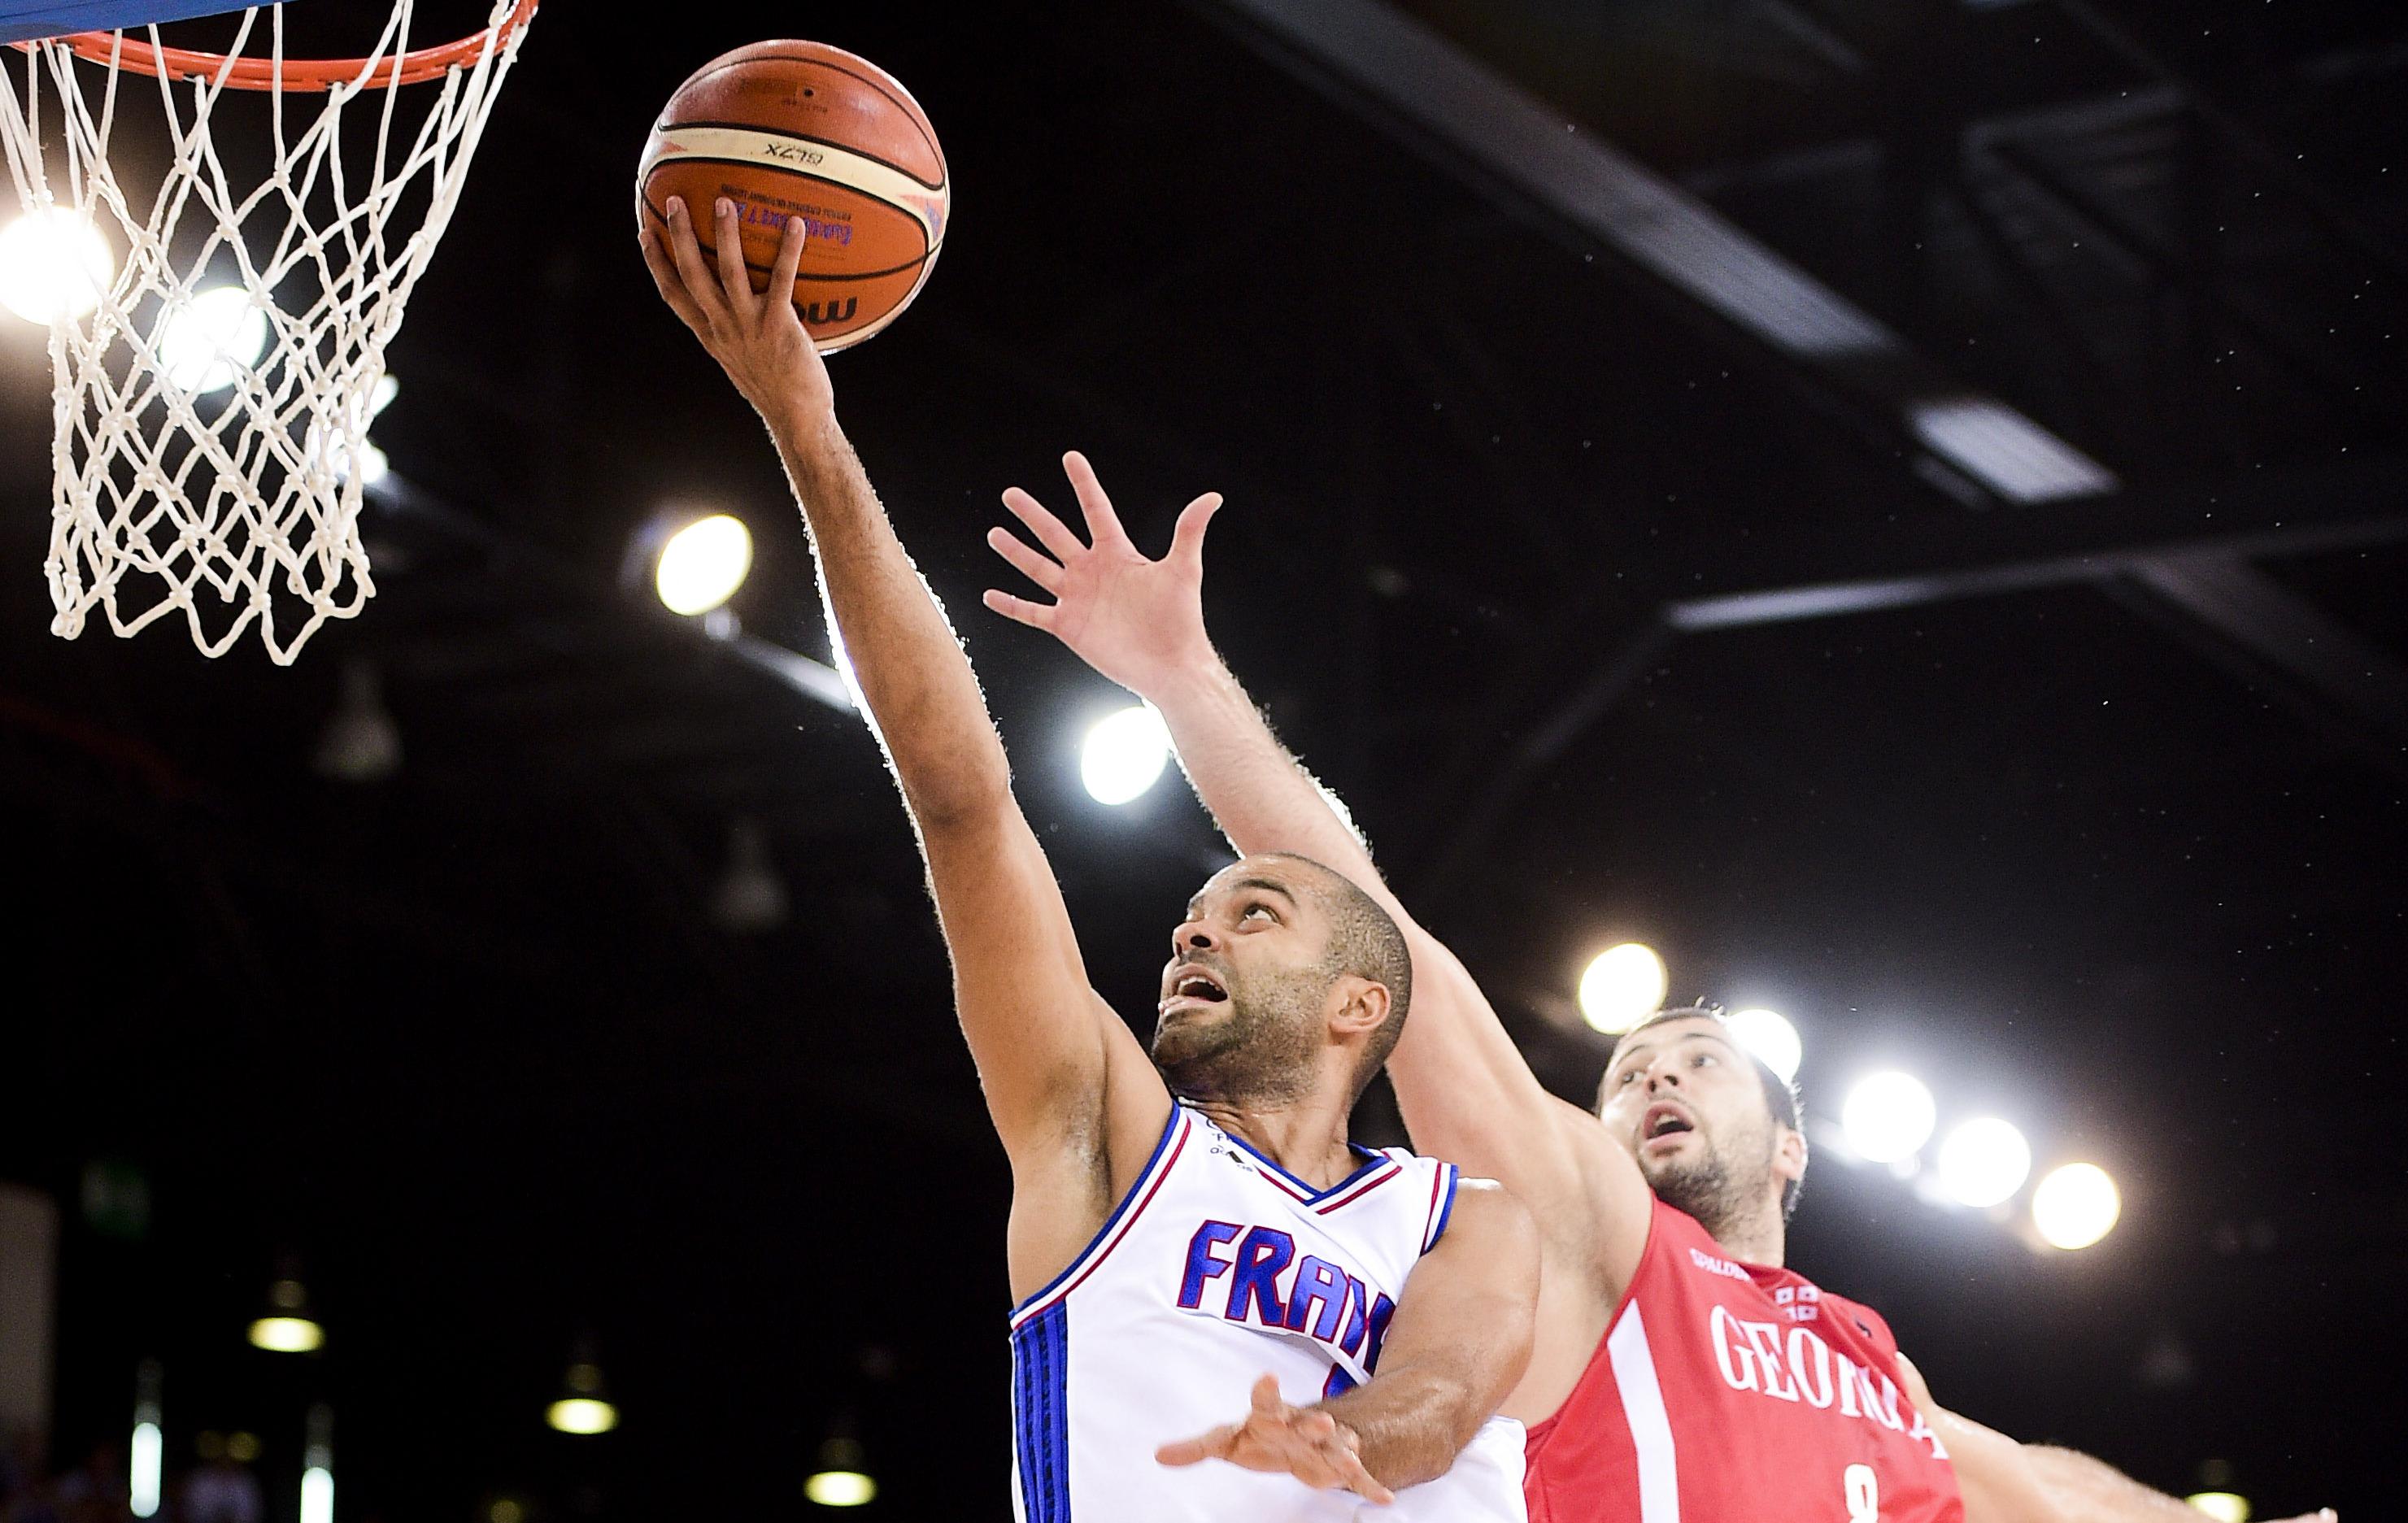 Basket - Equipe de France - La France martyrise la G�orgie